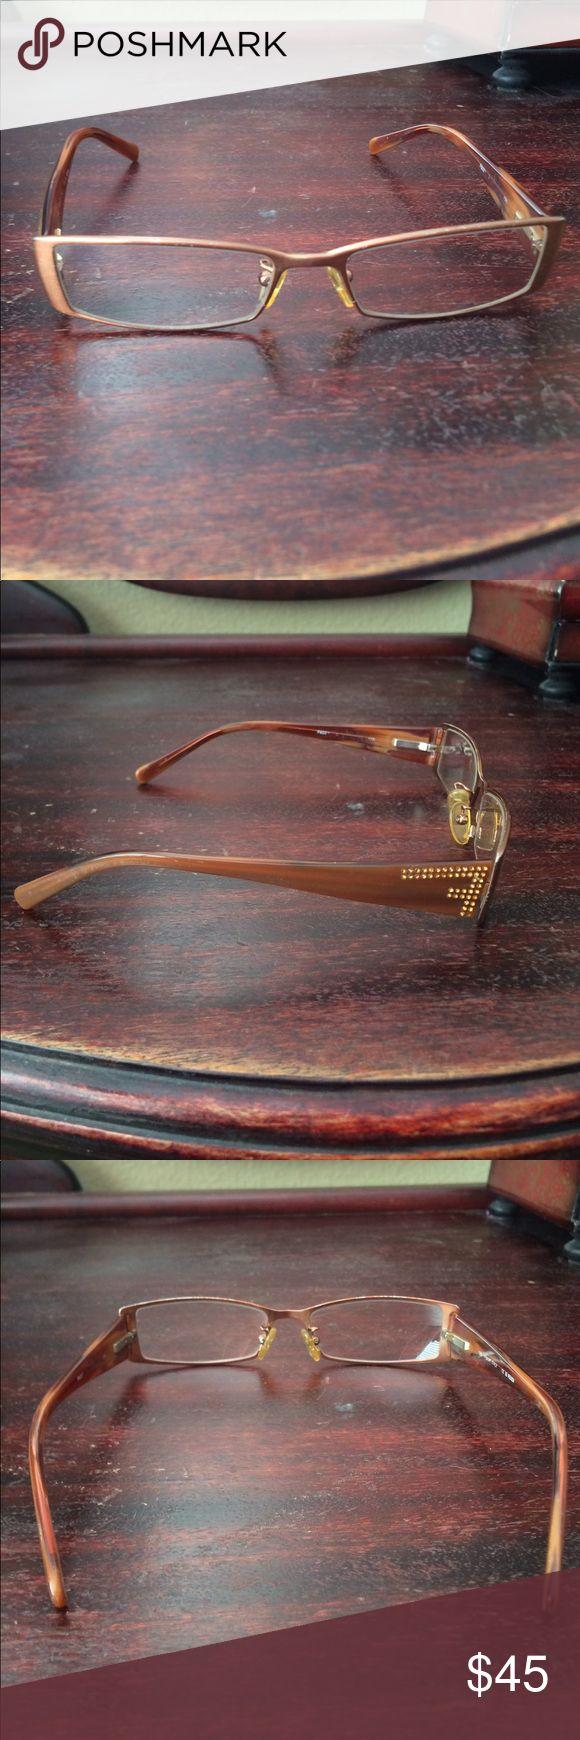 Women's Copper Fendi Glasses - Frames Used prescription frames. Copper in color with sparkle very small stones on sides. Slight wear & scratches Fendi Accessories Glasses